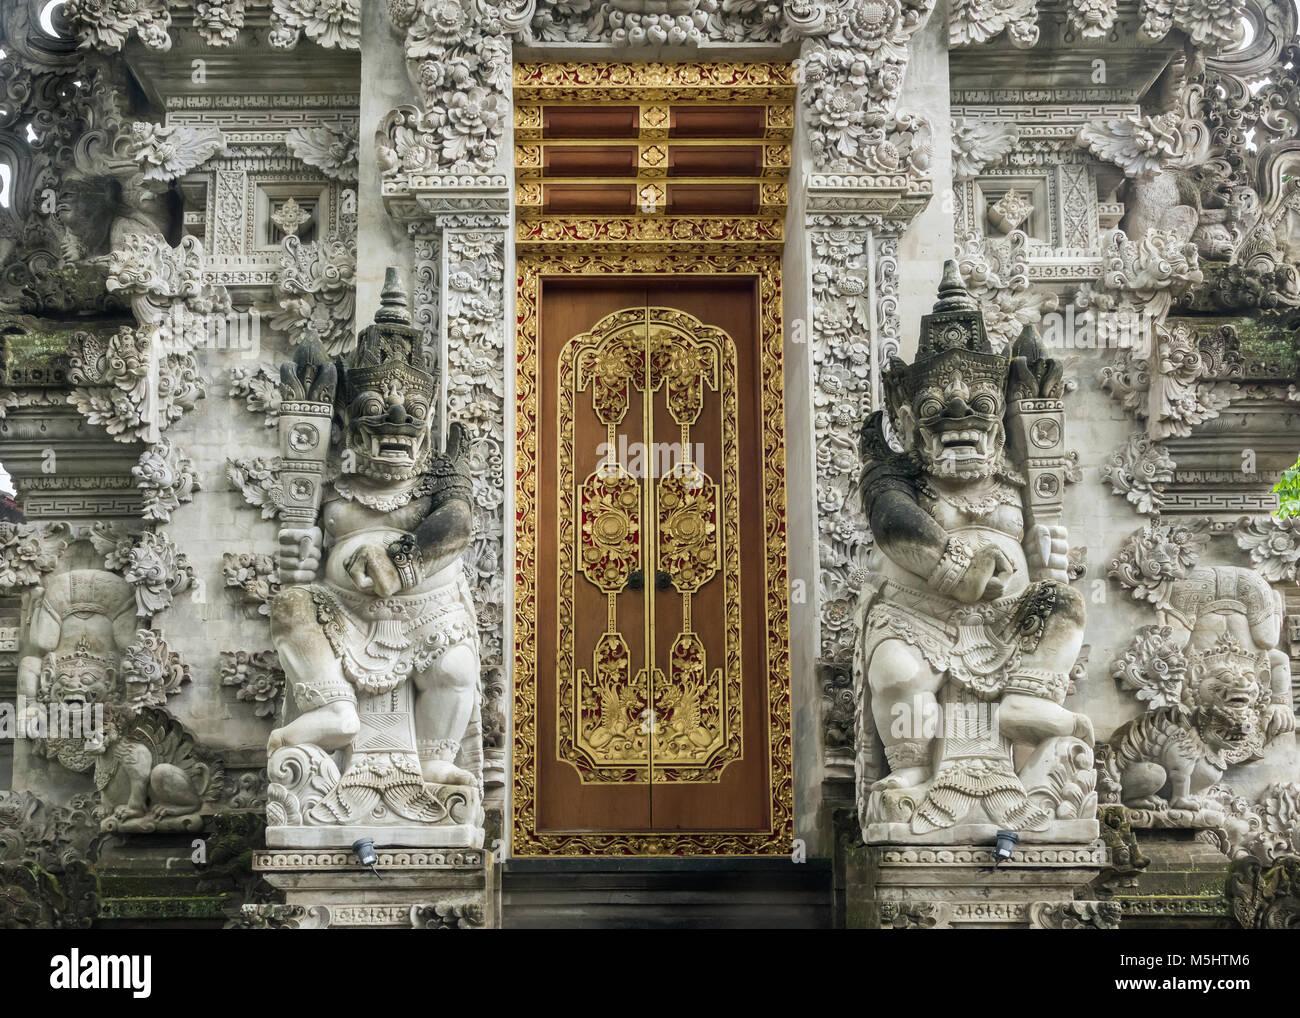 Demons and ornate doors, Puri Kantor, Ubud, Bali - Stock Image